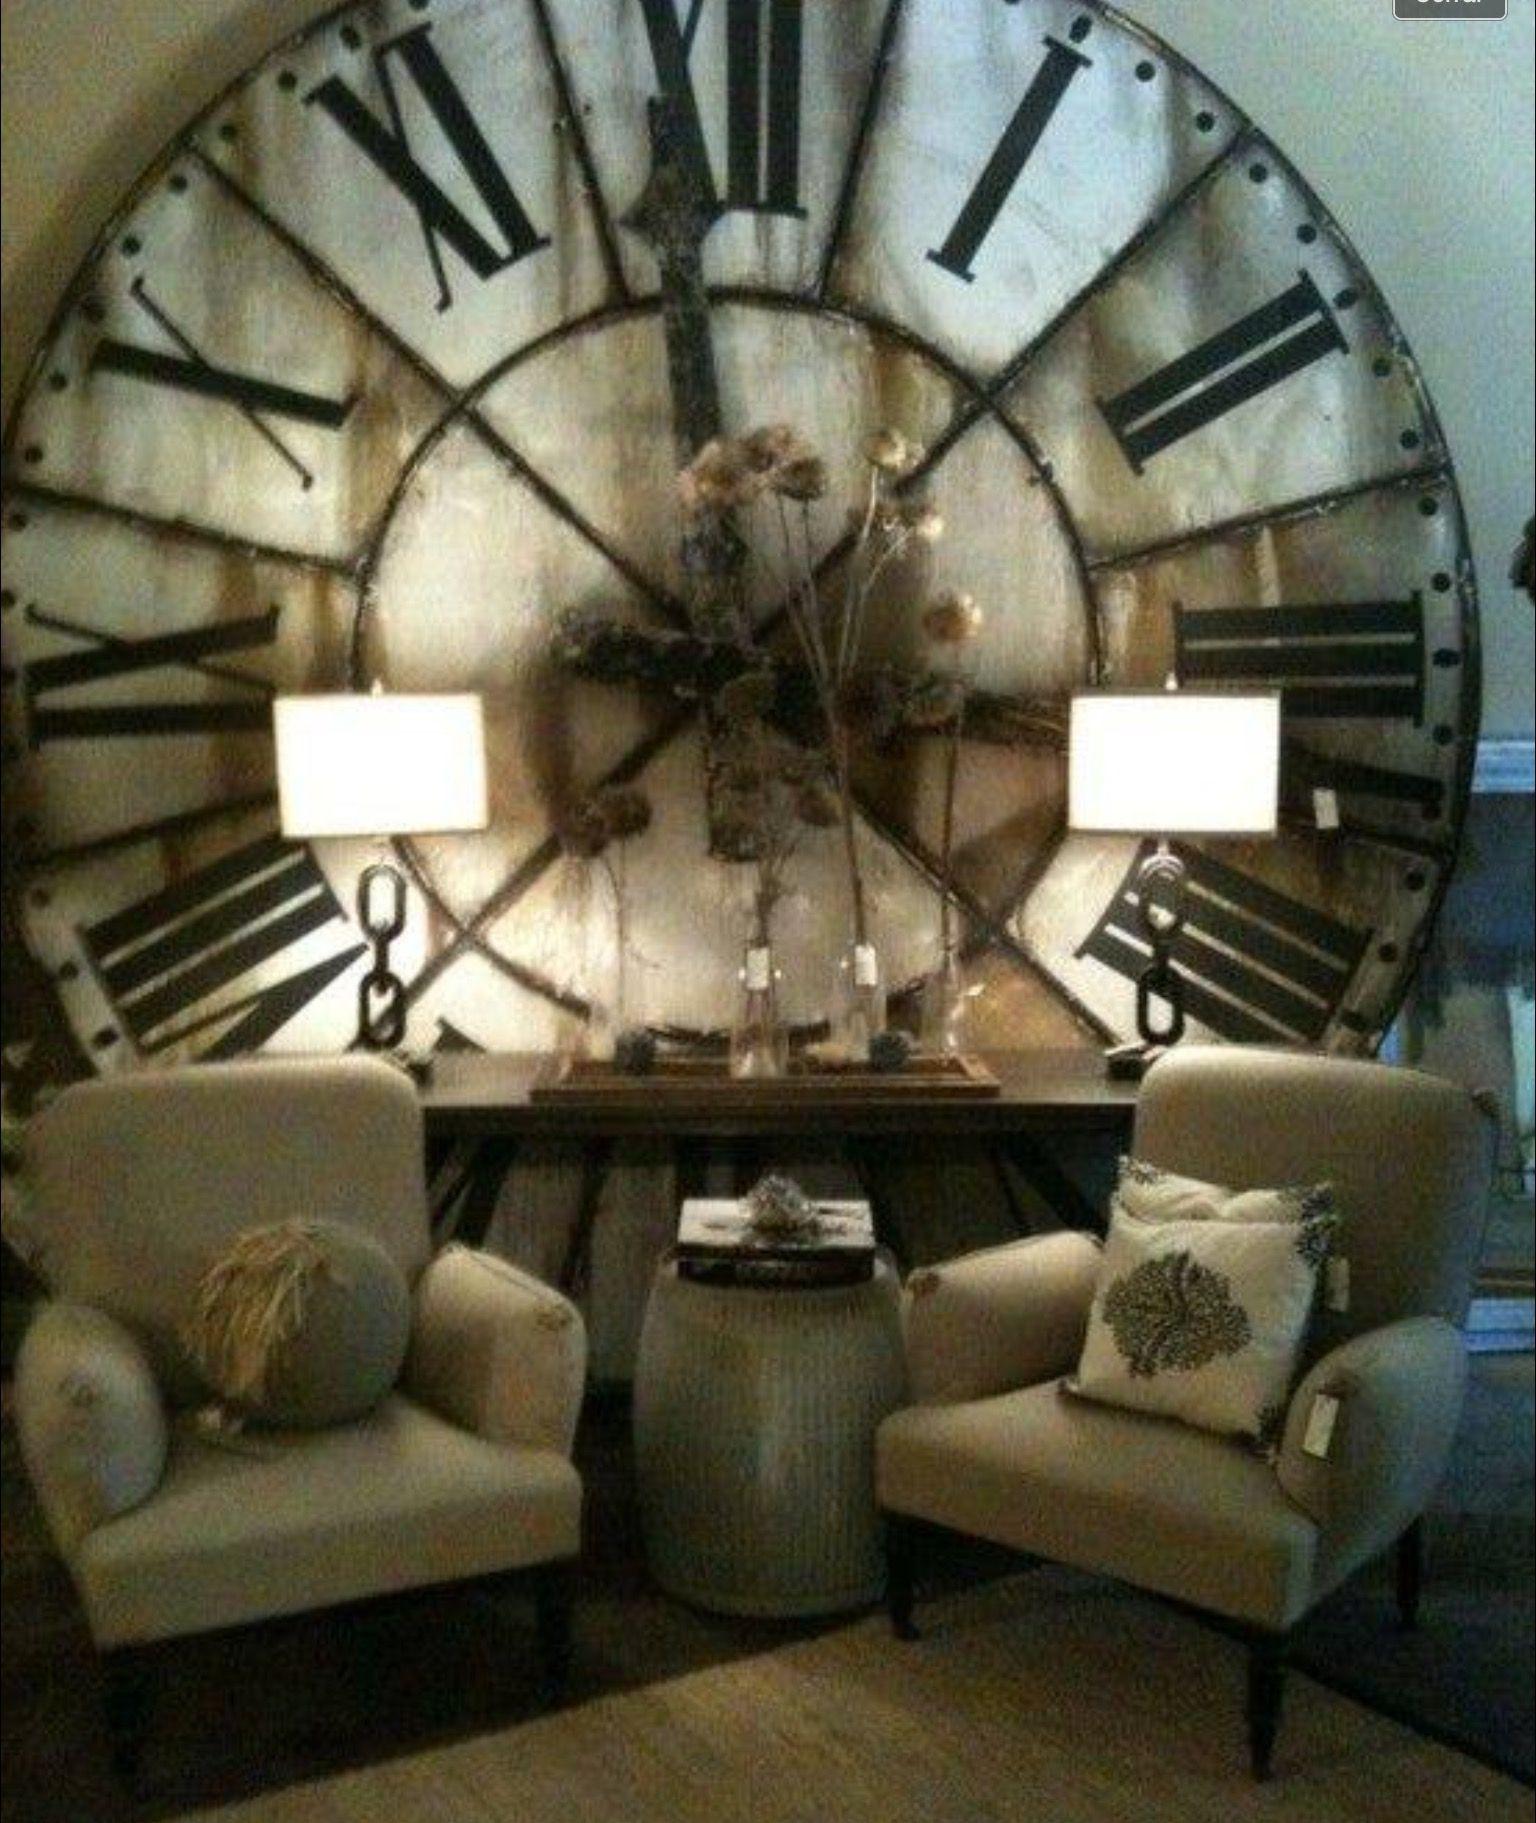 Oversized Decorative Wall Clocks Ideas On Foter